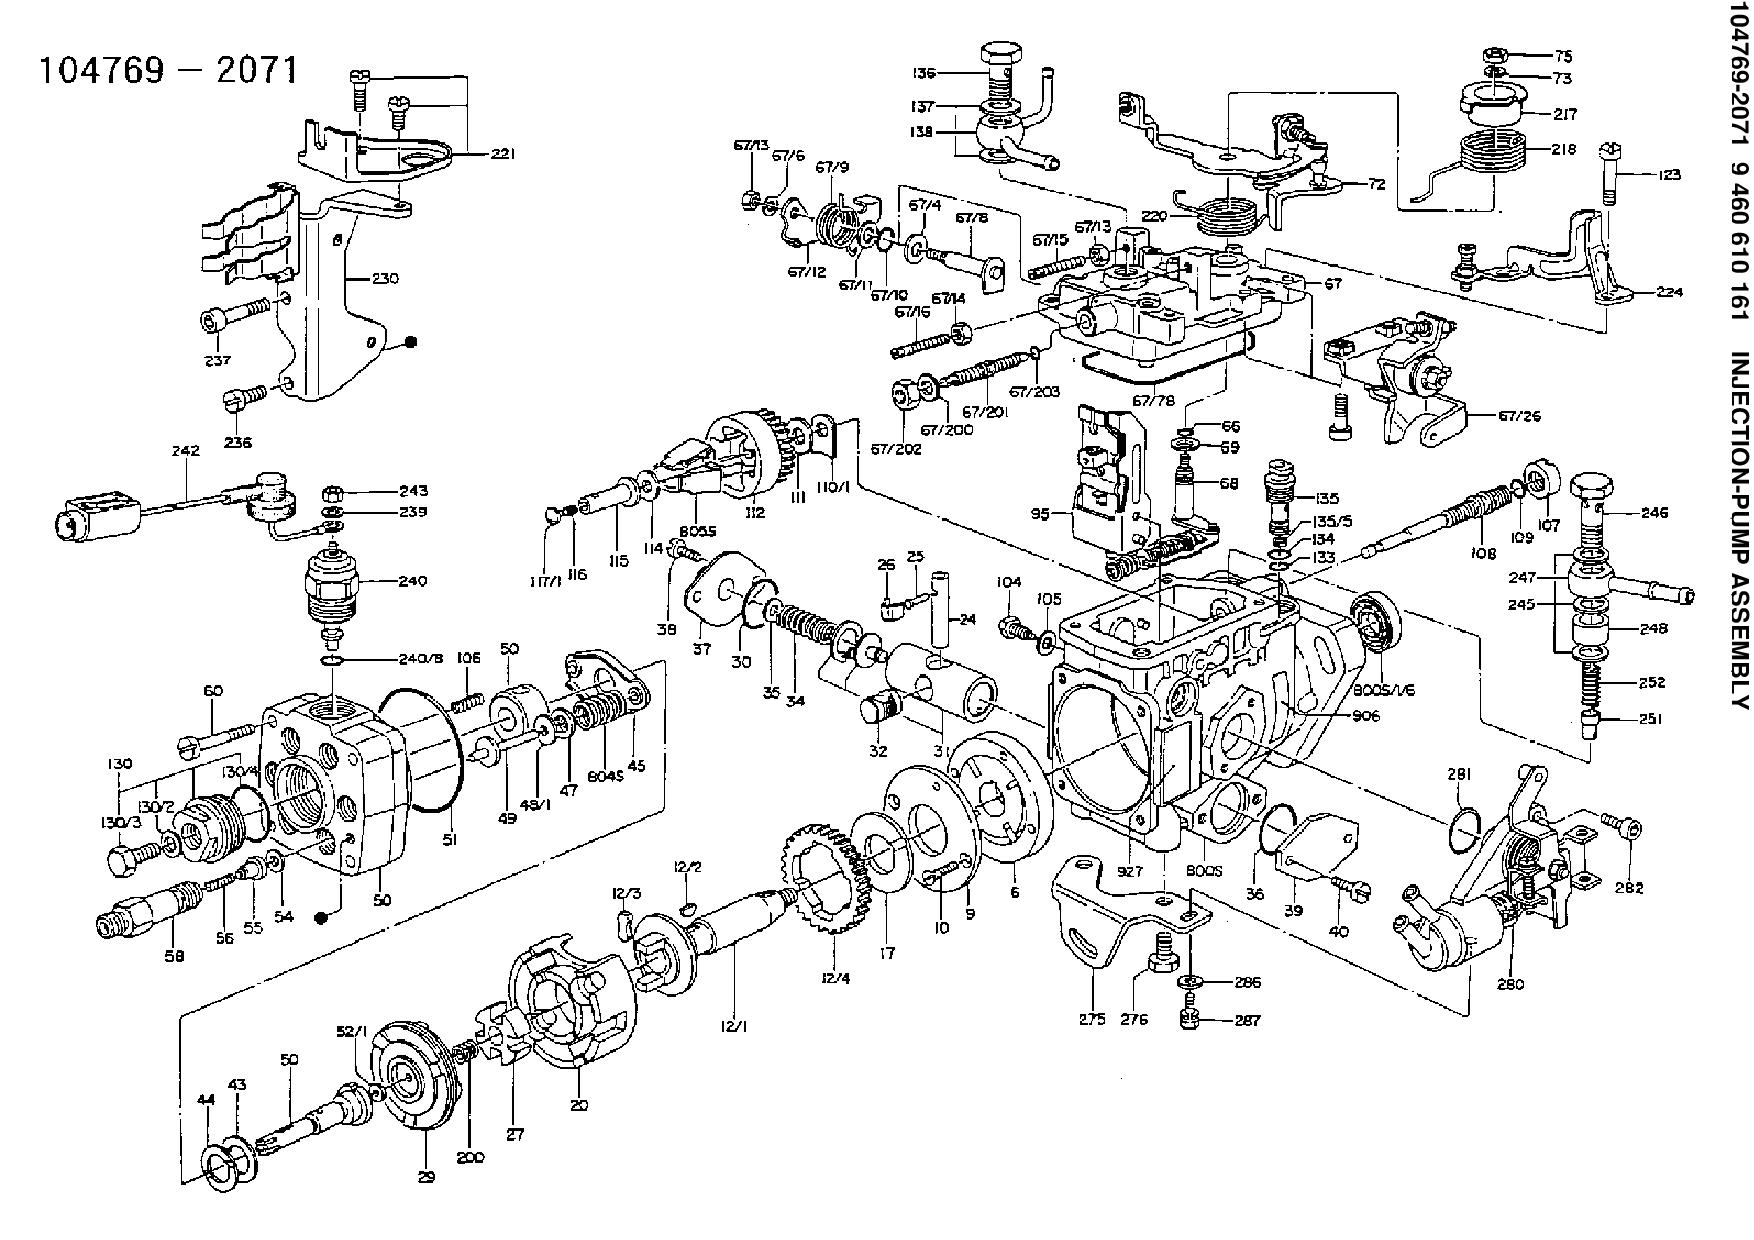 2005 cadillac srx starter diagram html